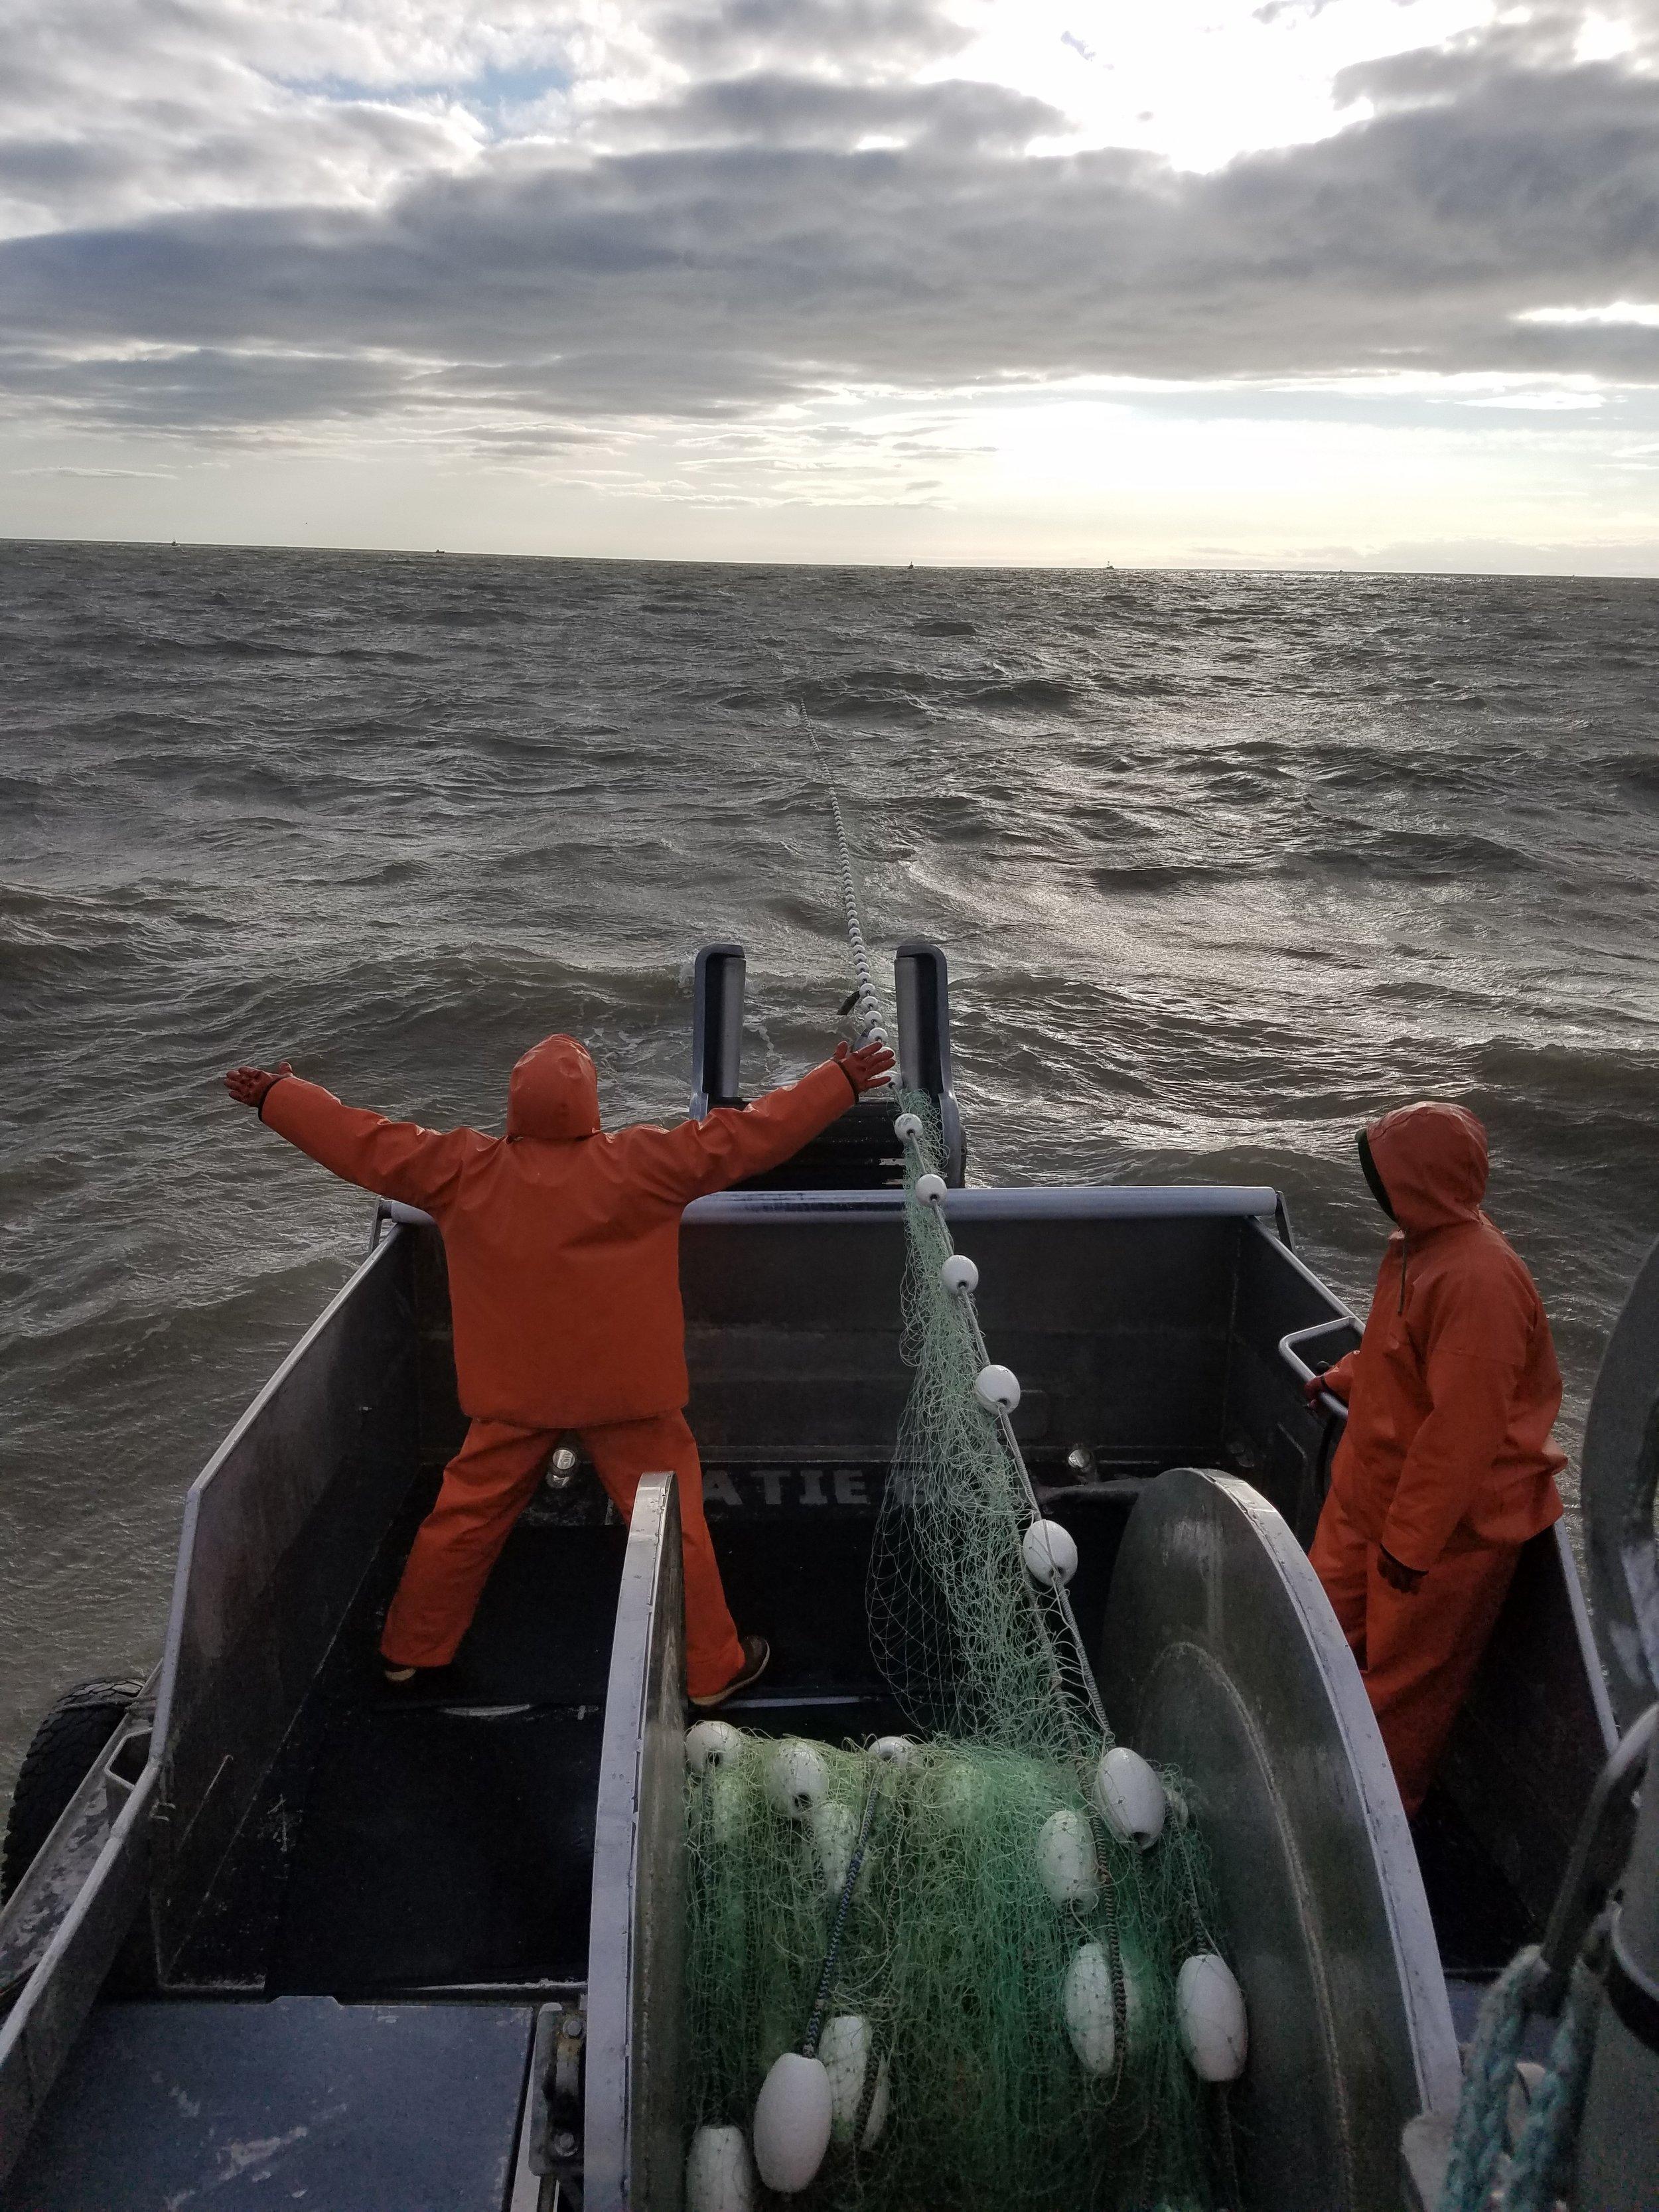 Rogotzkes on boat.jpg